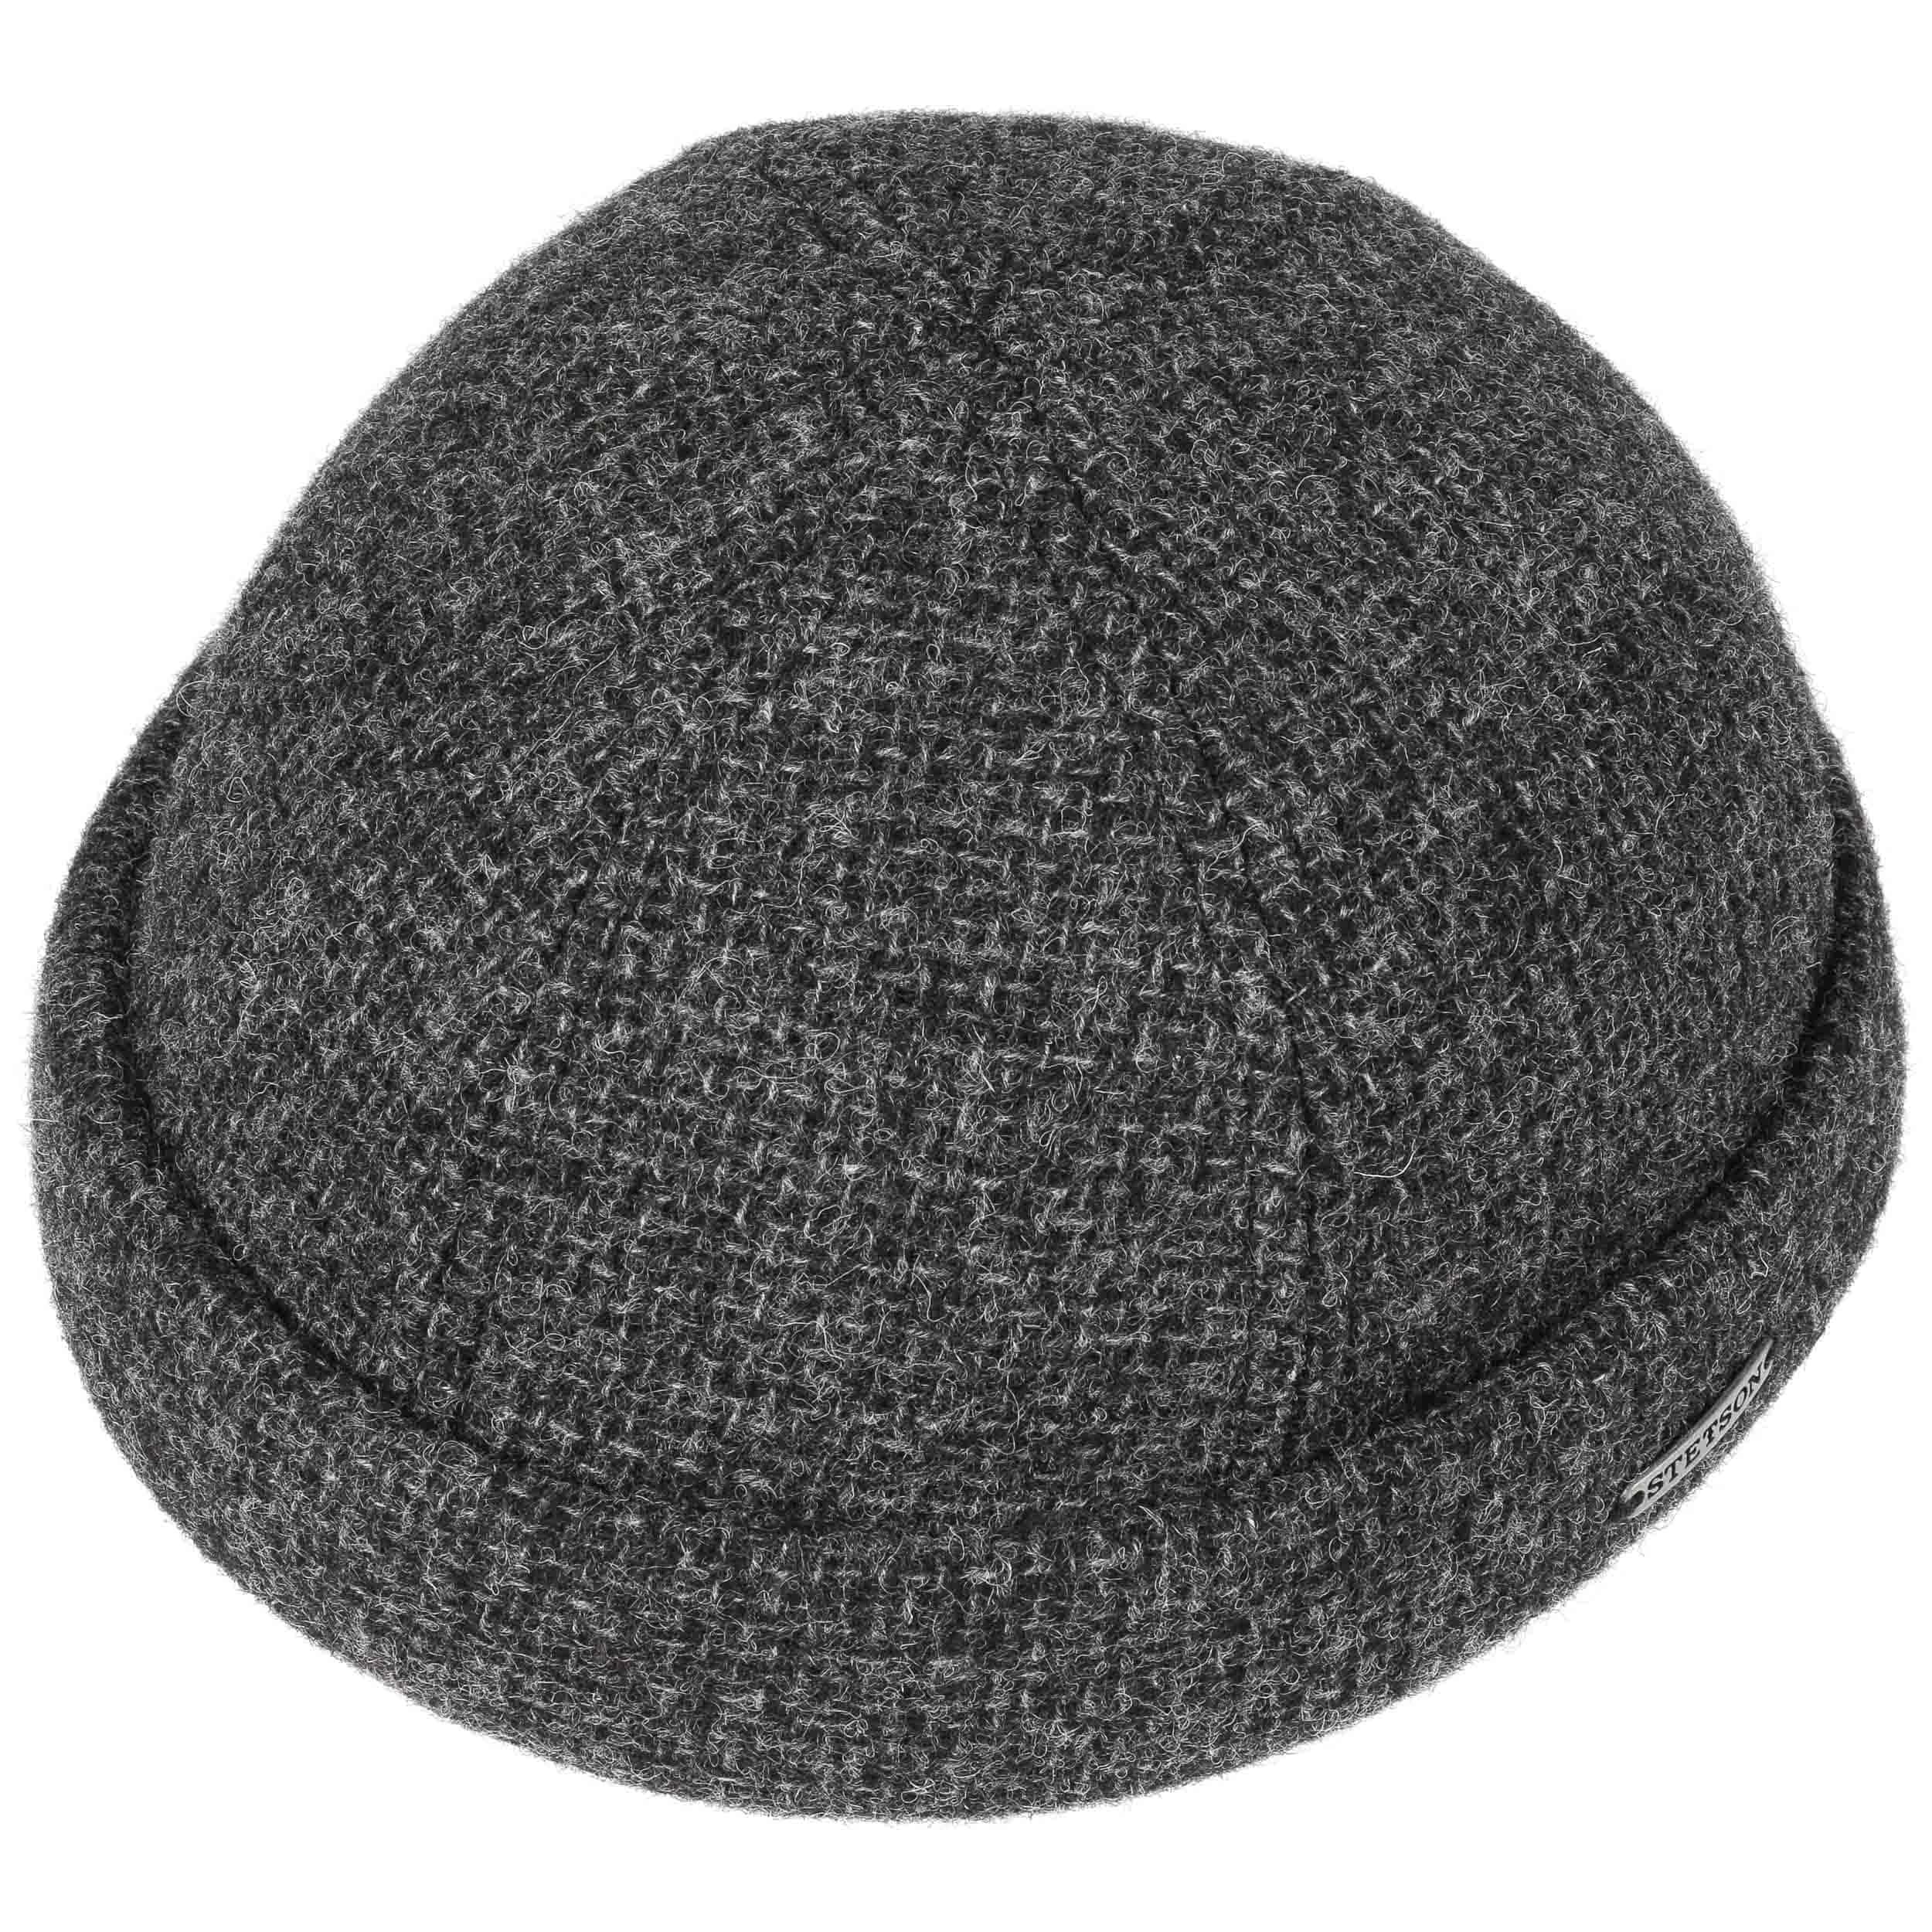 Wool Docker Hat by Stetson - anthracite 1 ... 66ec49847f97